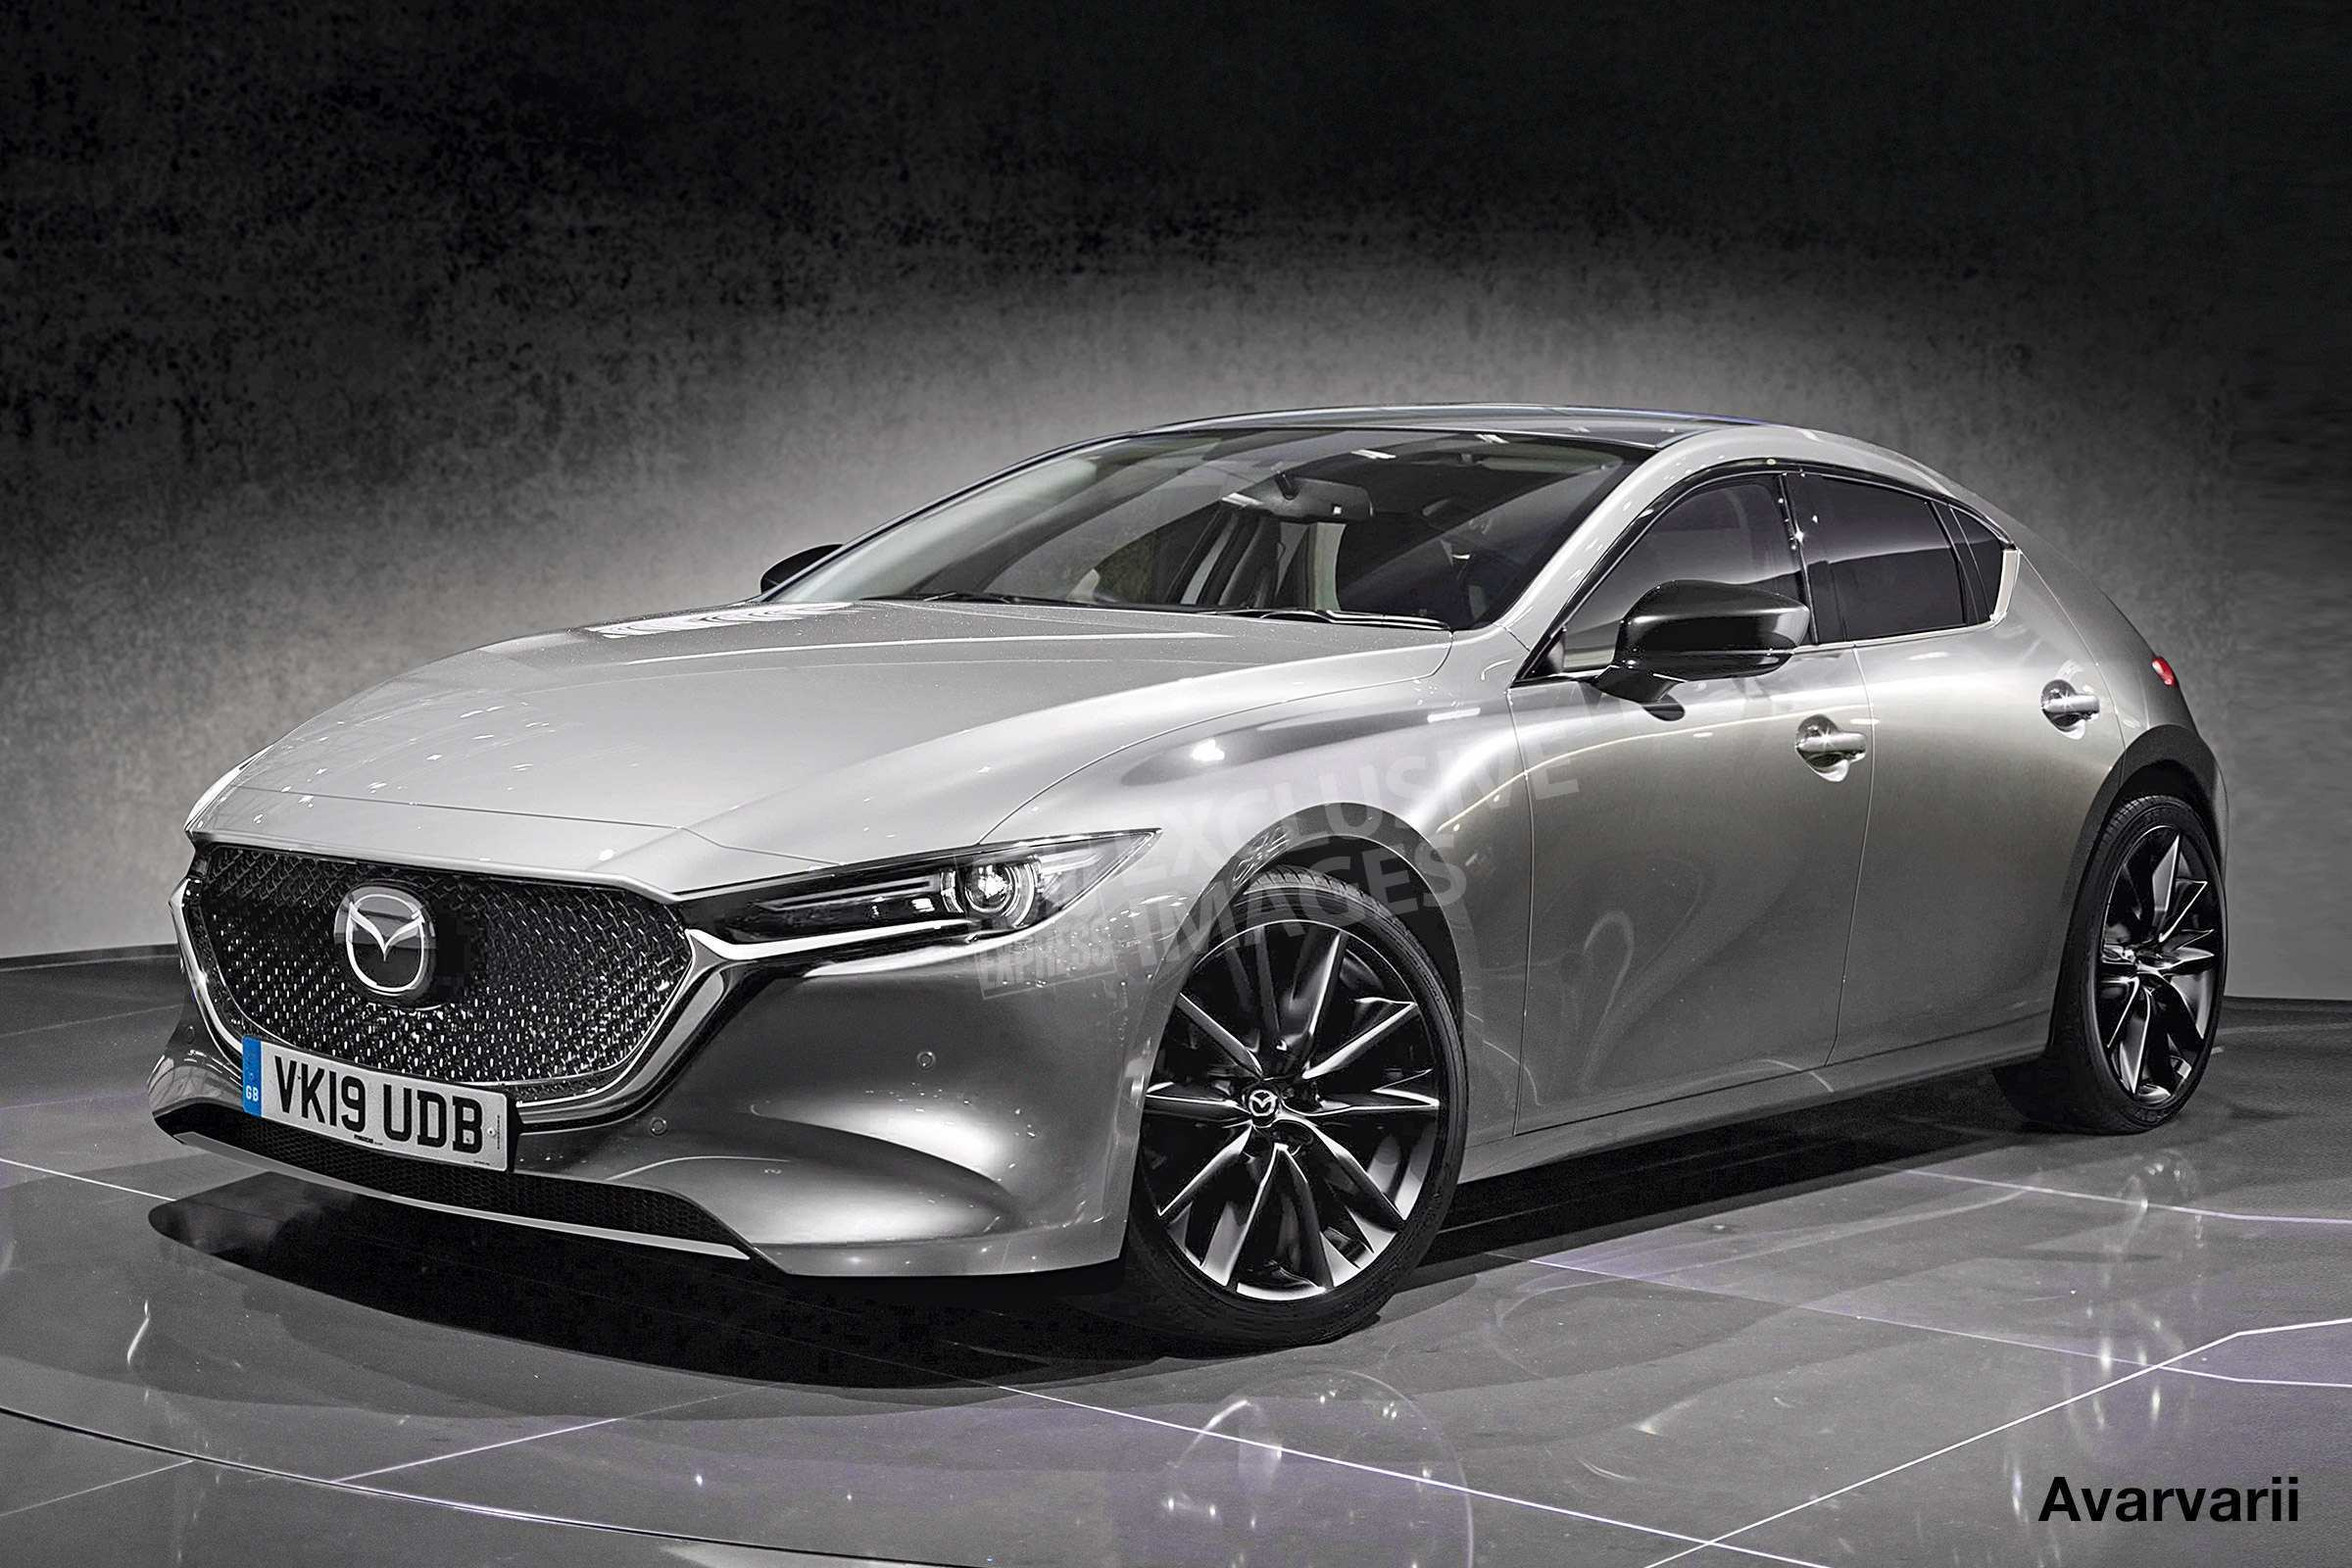 98 All New Mazda 3 Gt 2020 Specs for Mazda 3 Gt 2020